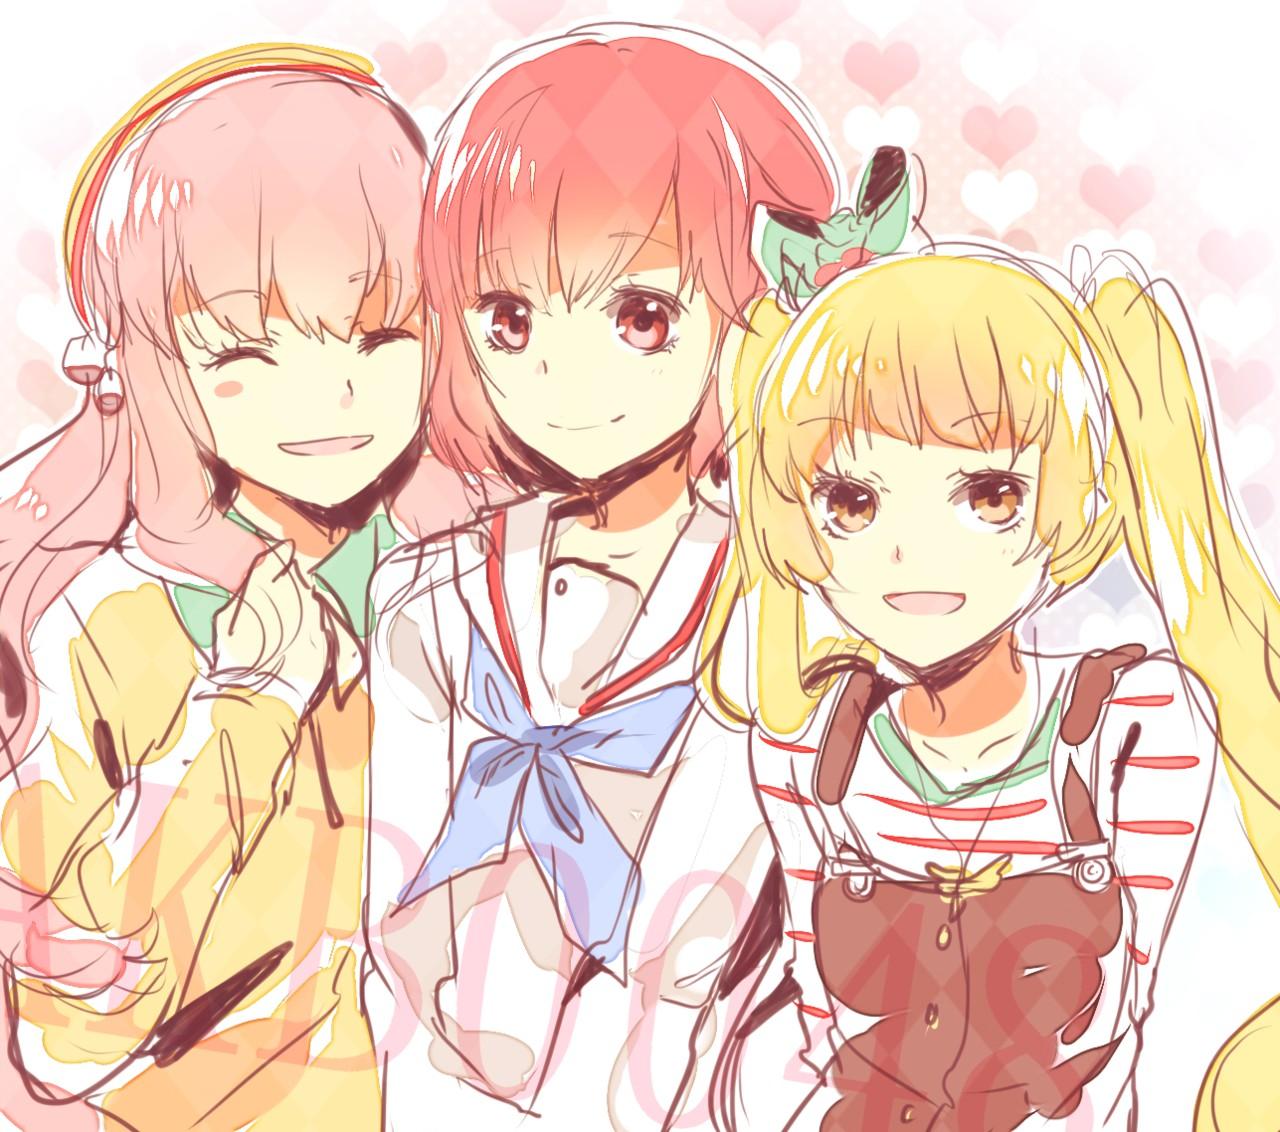 Ichijou Yuuka - AKB0048 - Zerochan Anime Image Board